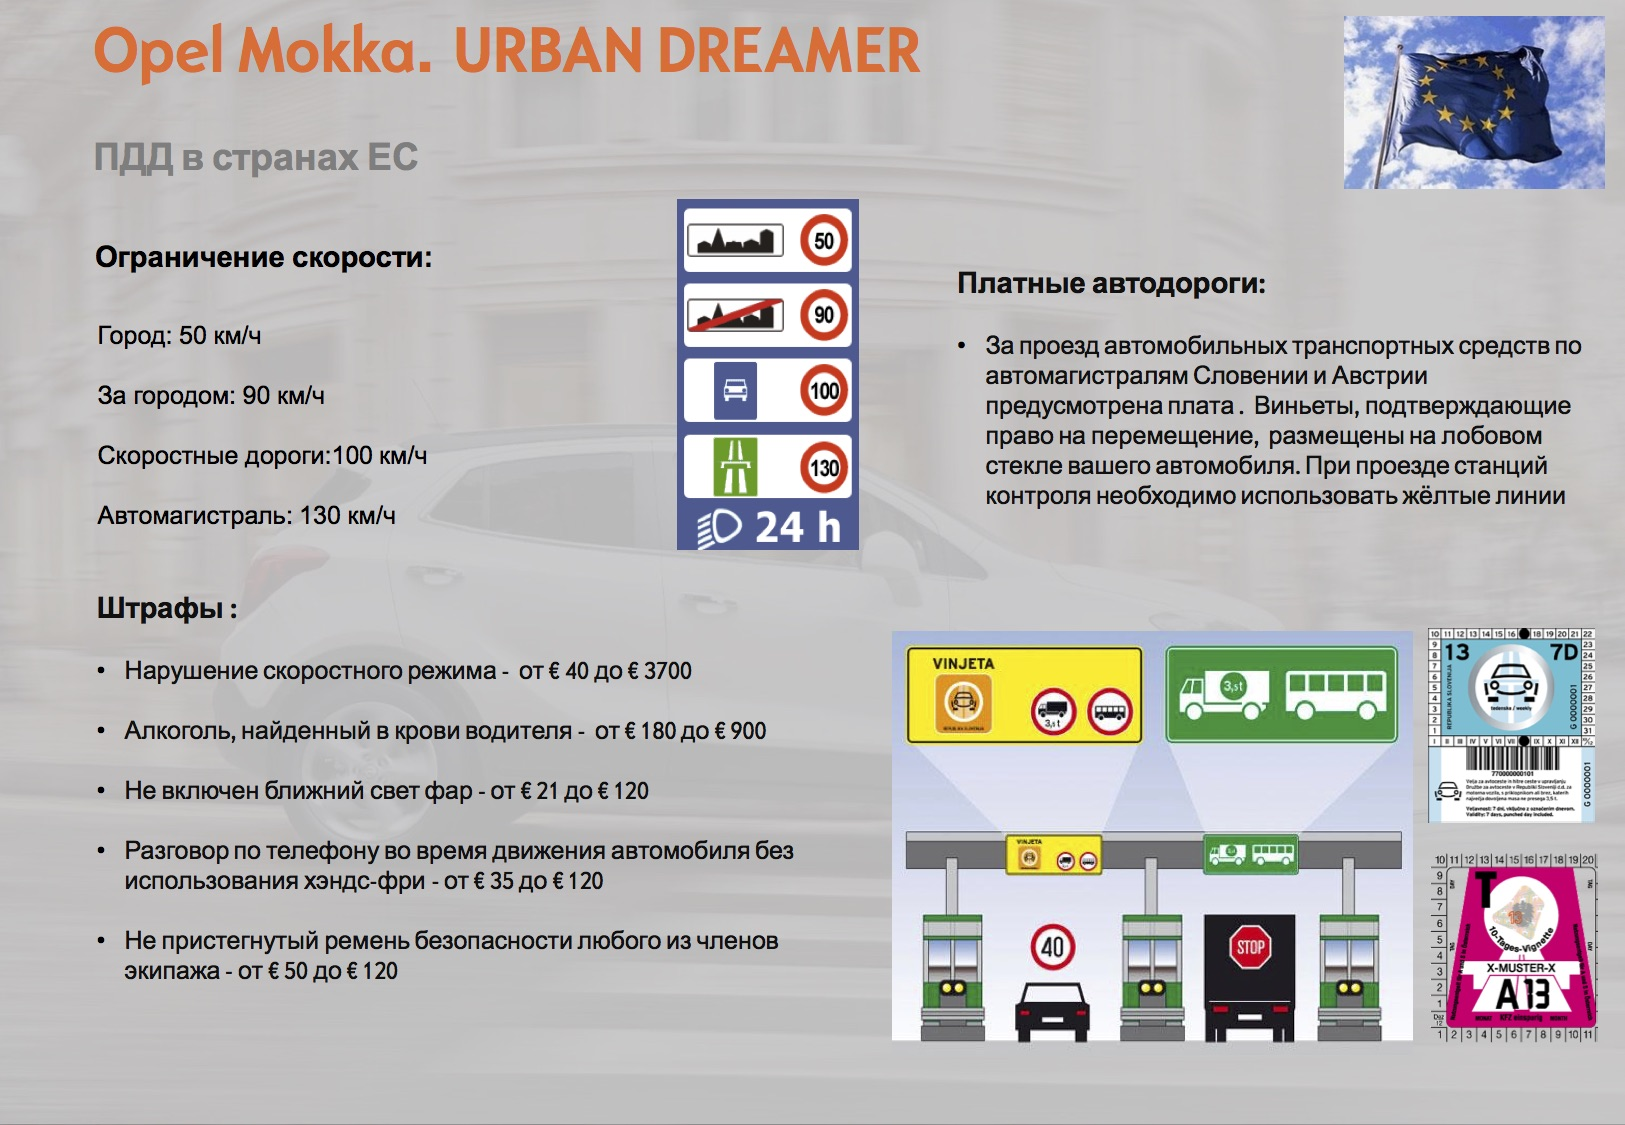 Opel Mokka: Встречаем гостей. Короткое знакомство и брифинг по маршруту и ПДД